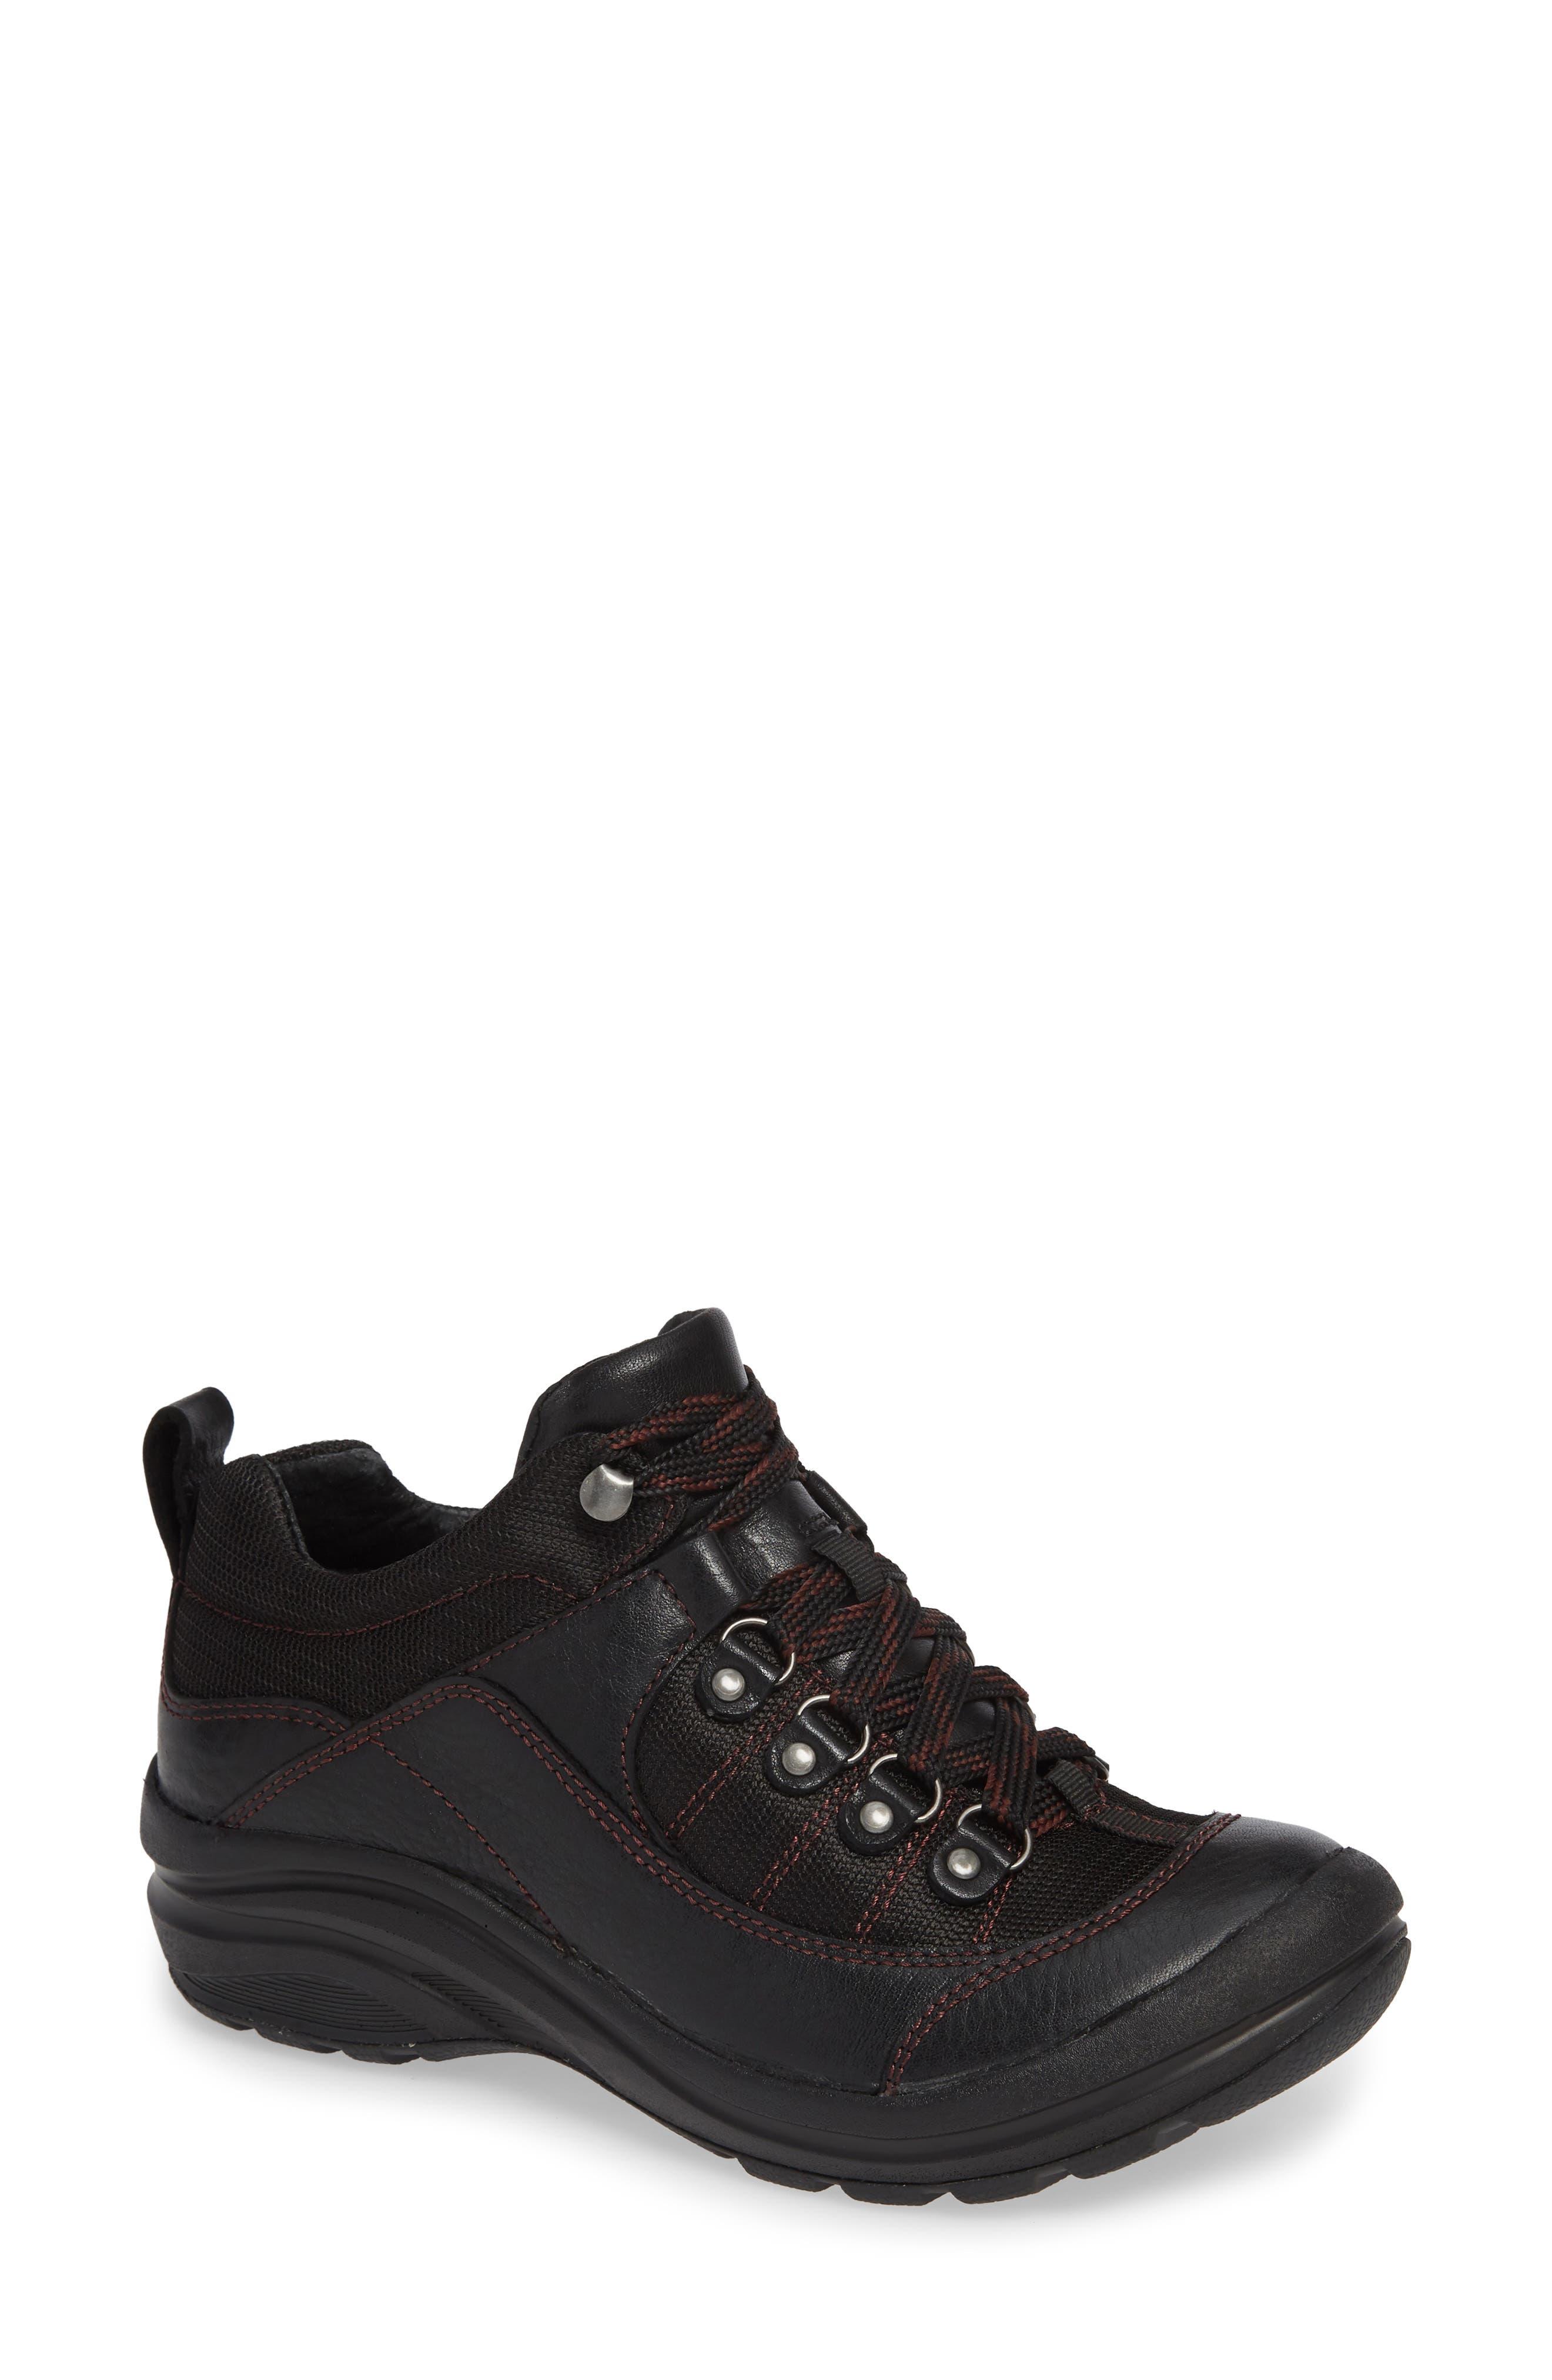 Bionica Milliston Waterproof Hiking Waterproof Boot, Black